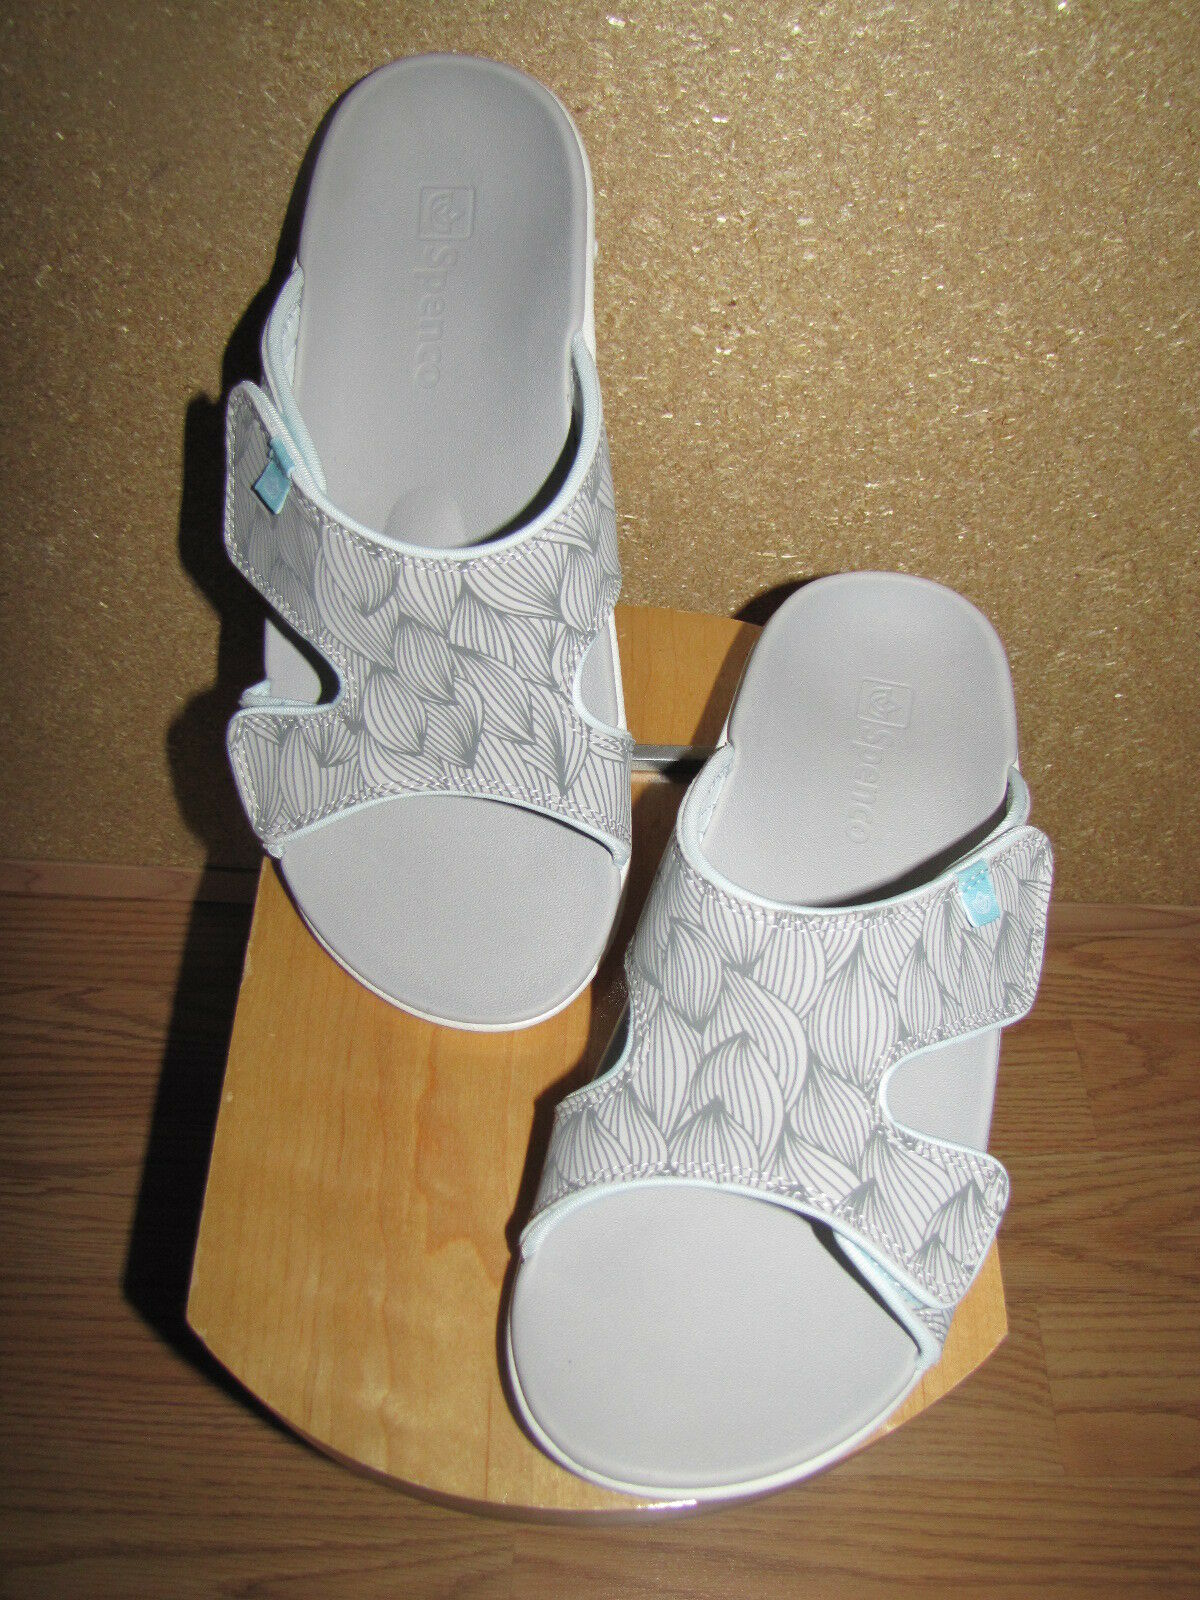 Nuevo Sin Caja Spenco 'ola' 'ola' 'ola' Sandalias ortótica Diapositiva gris - 9 40 europeo  de moda